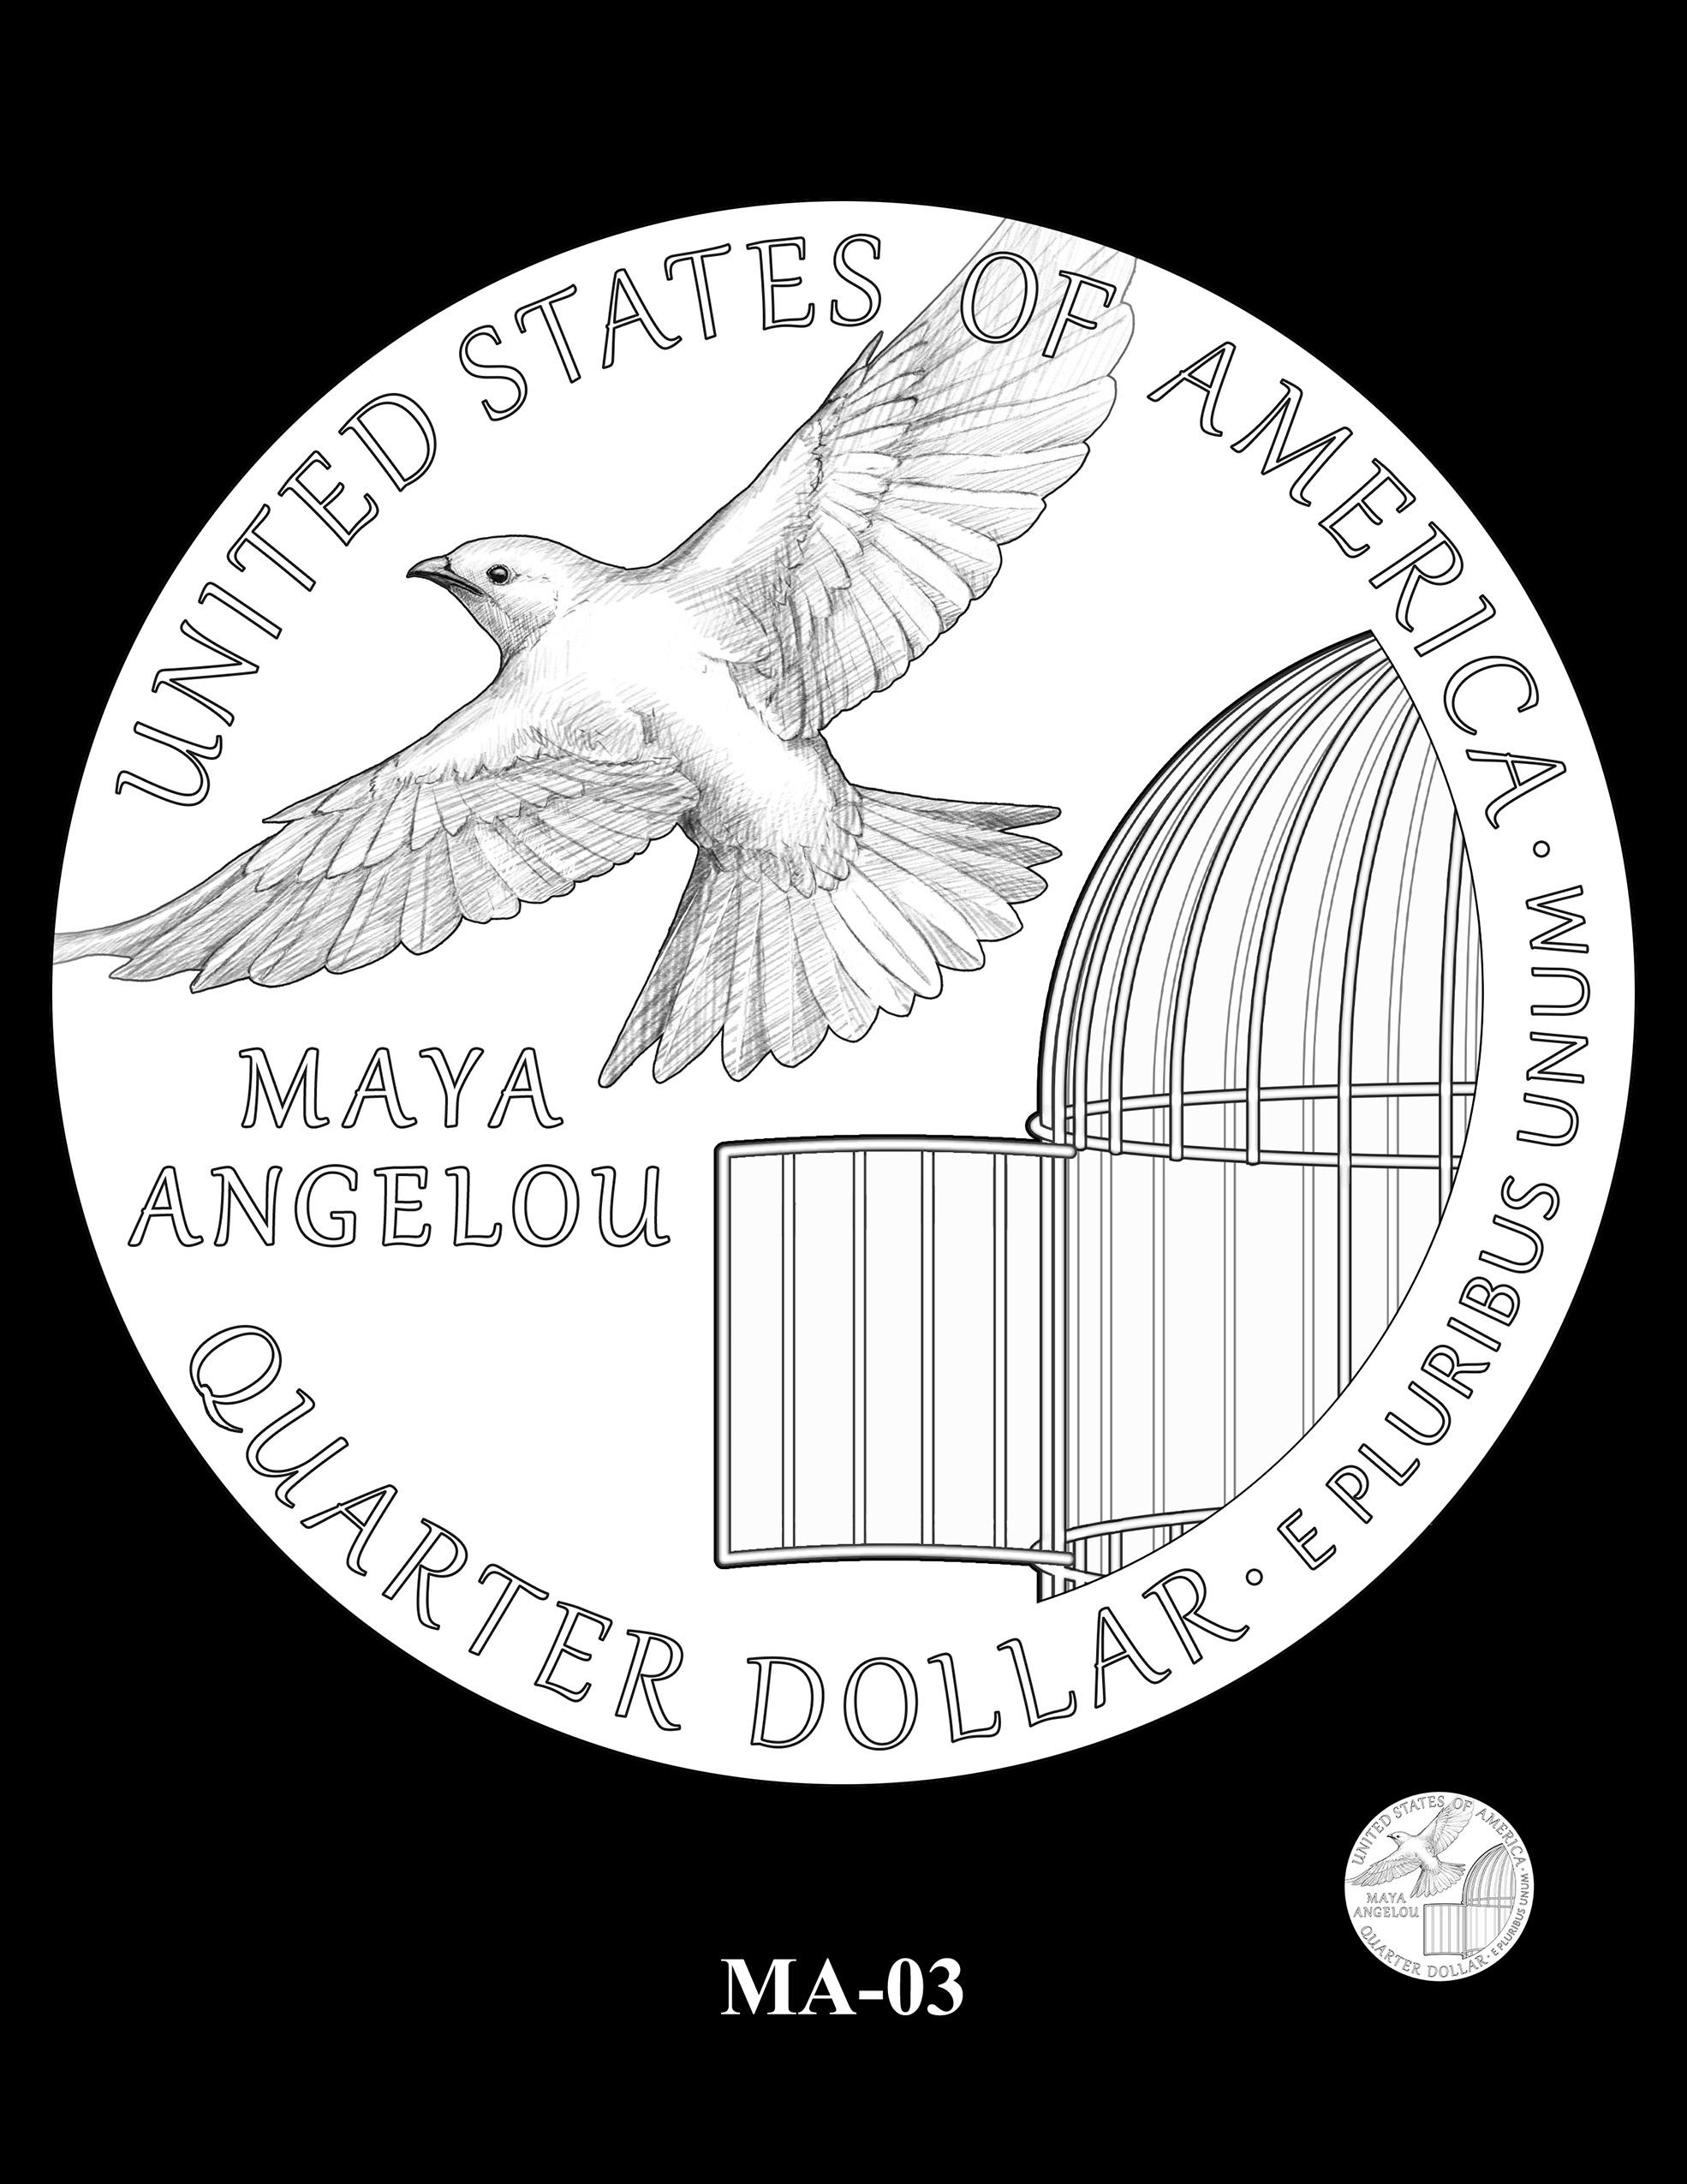 MA-03 -- 2022 American Women Quarters - Maya Angelou Reverse